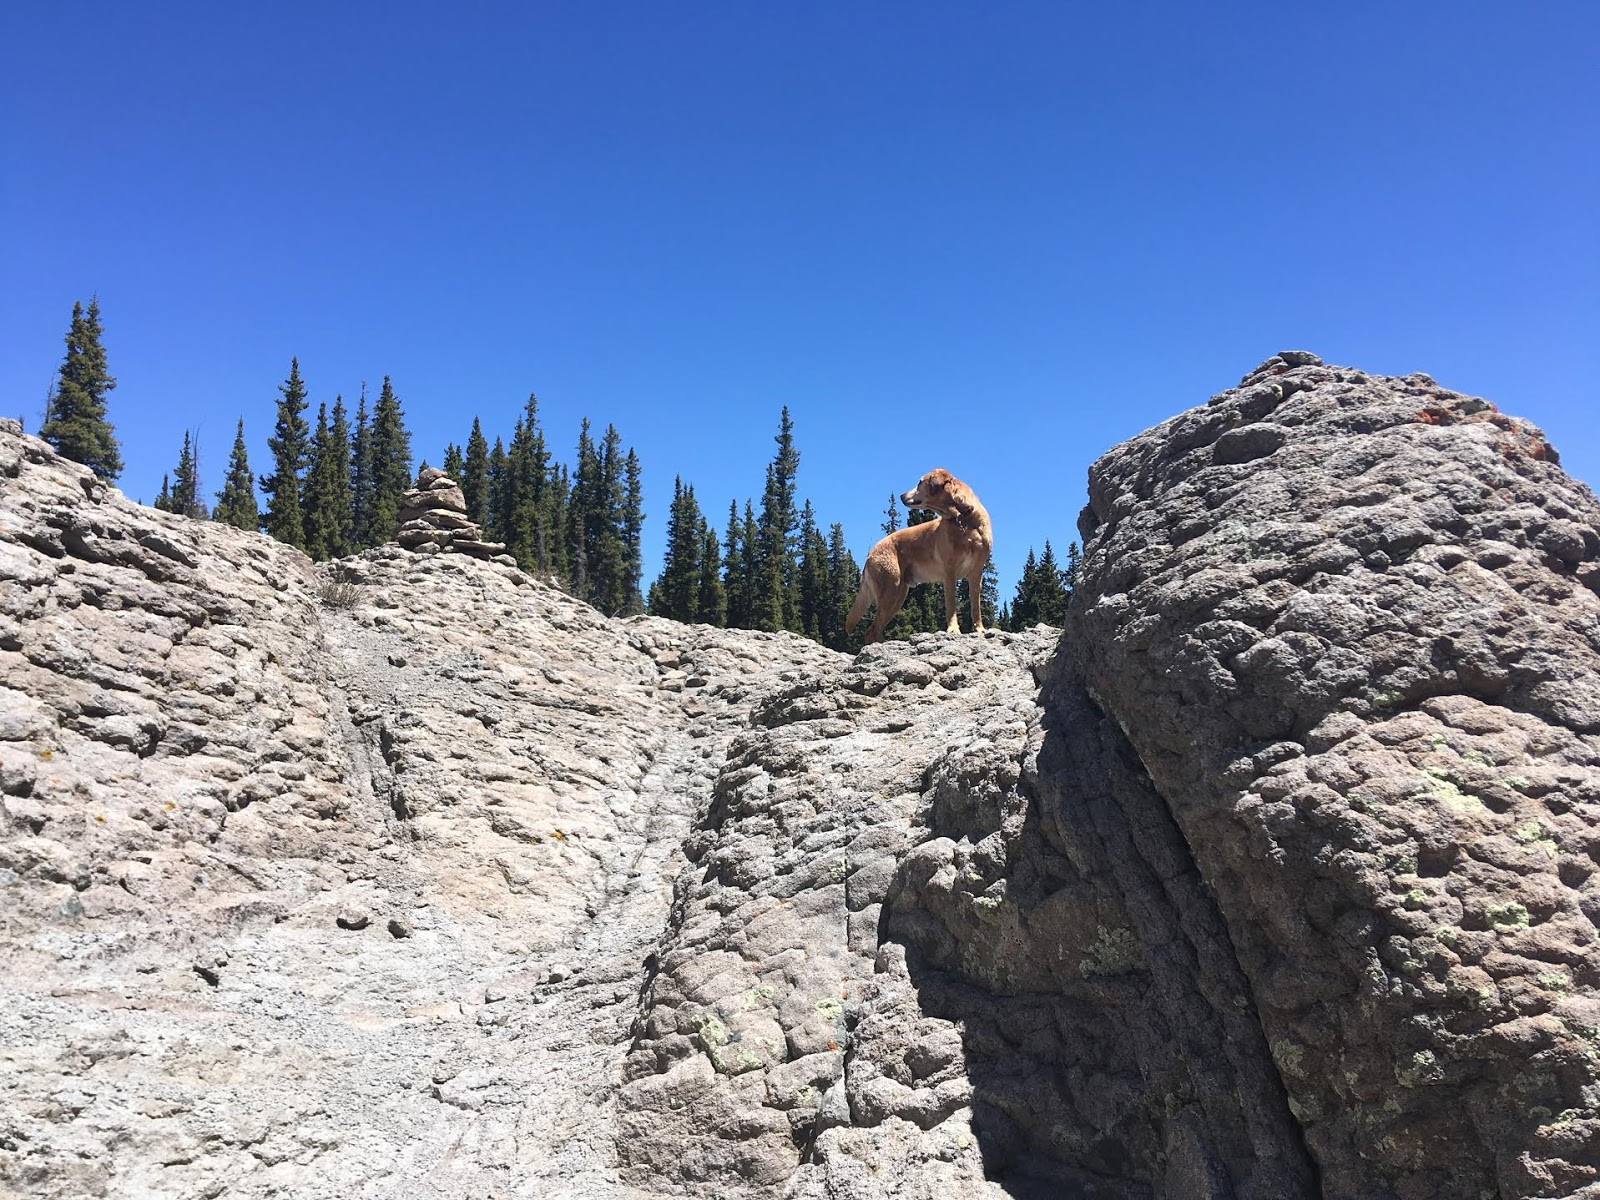 Hiking the Behunin Trail & Meeks Lake Loop, Boulder Mountain